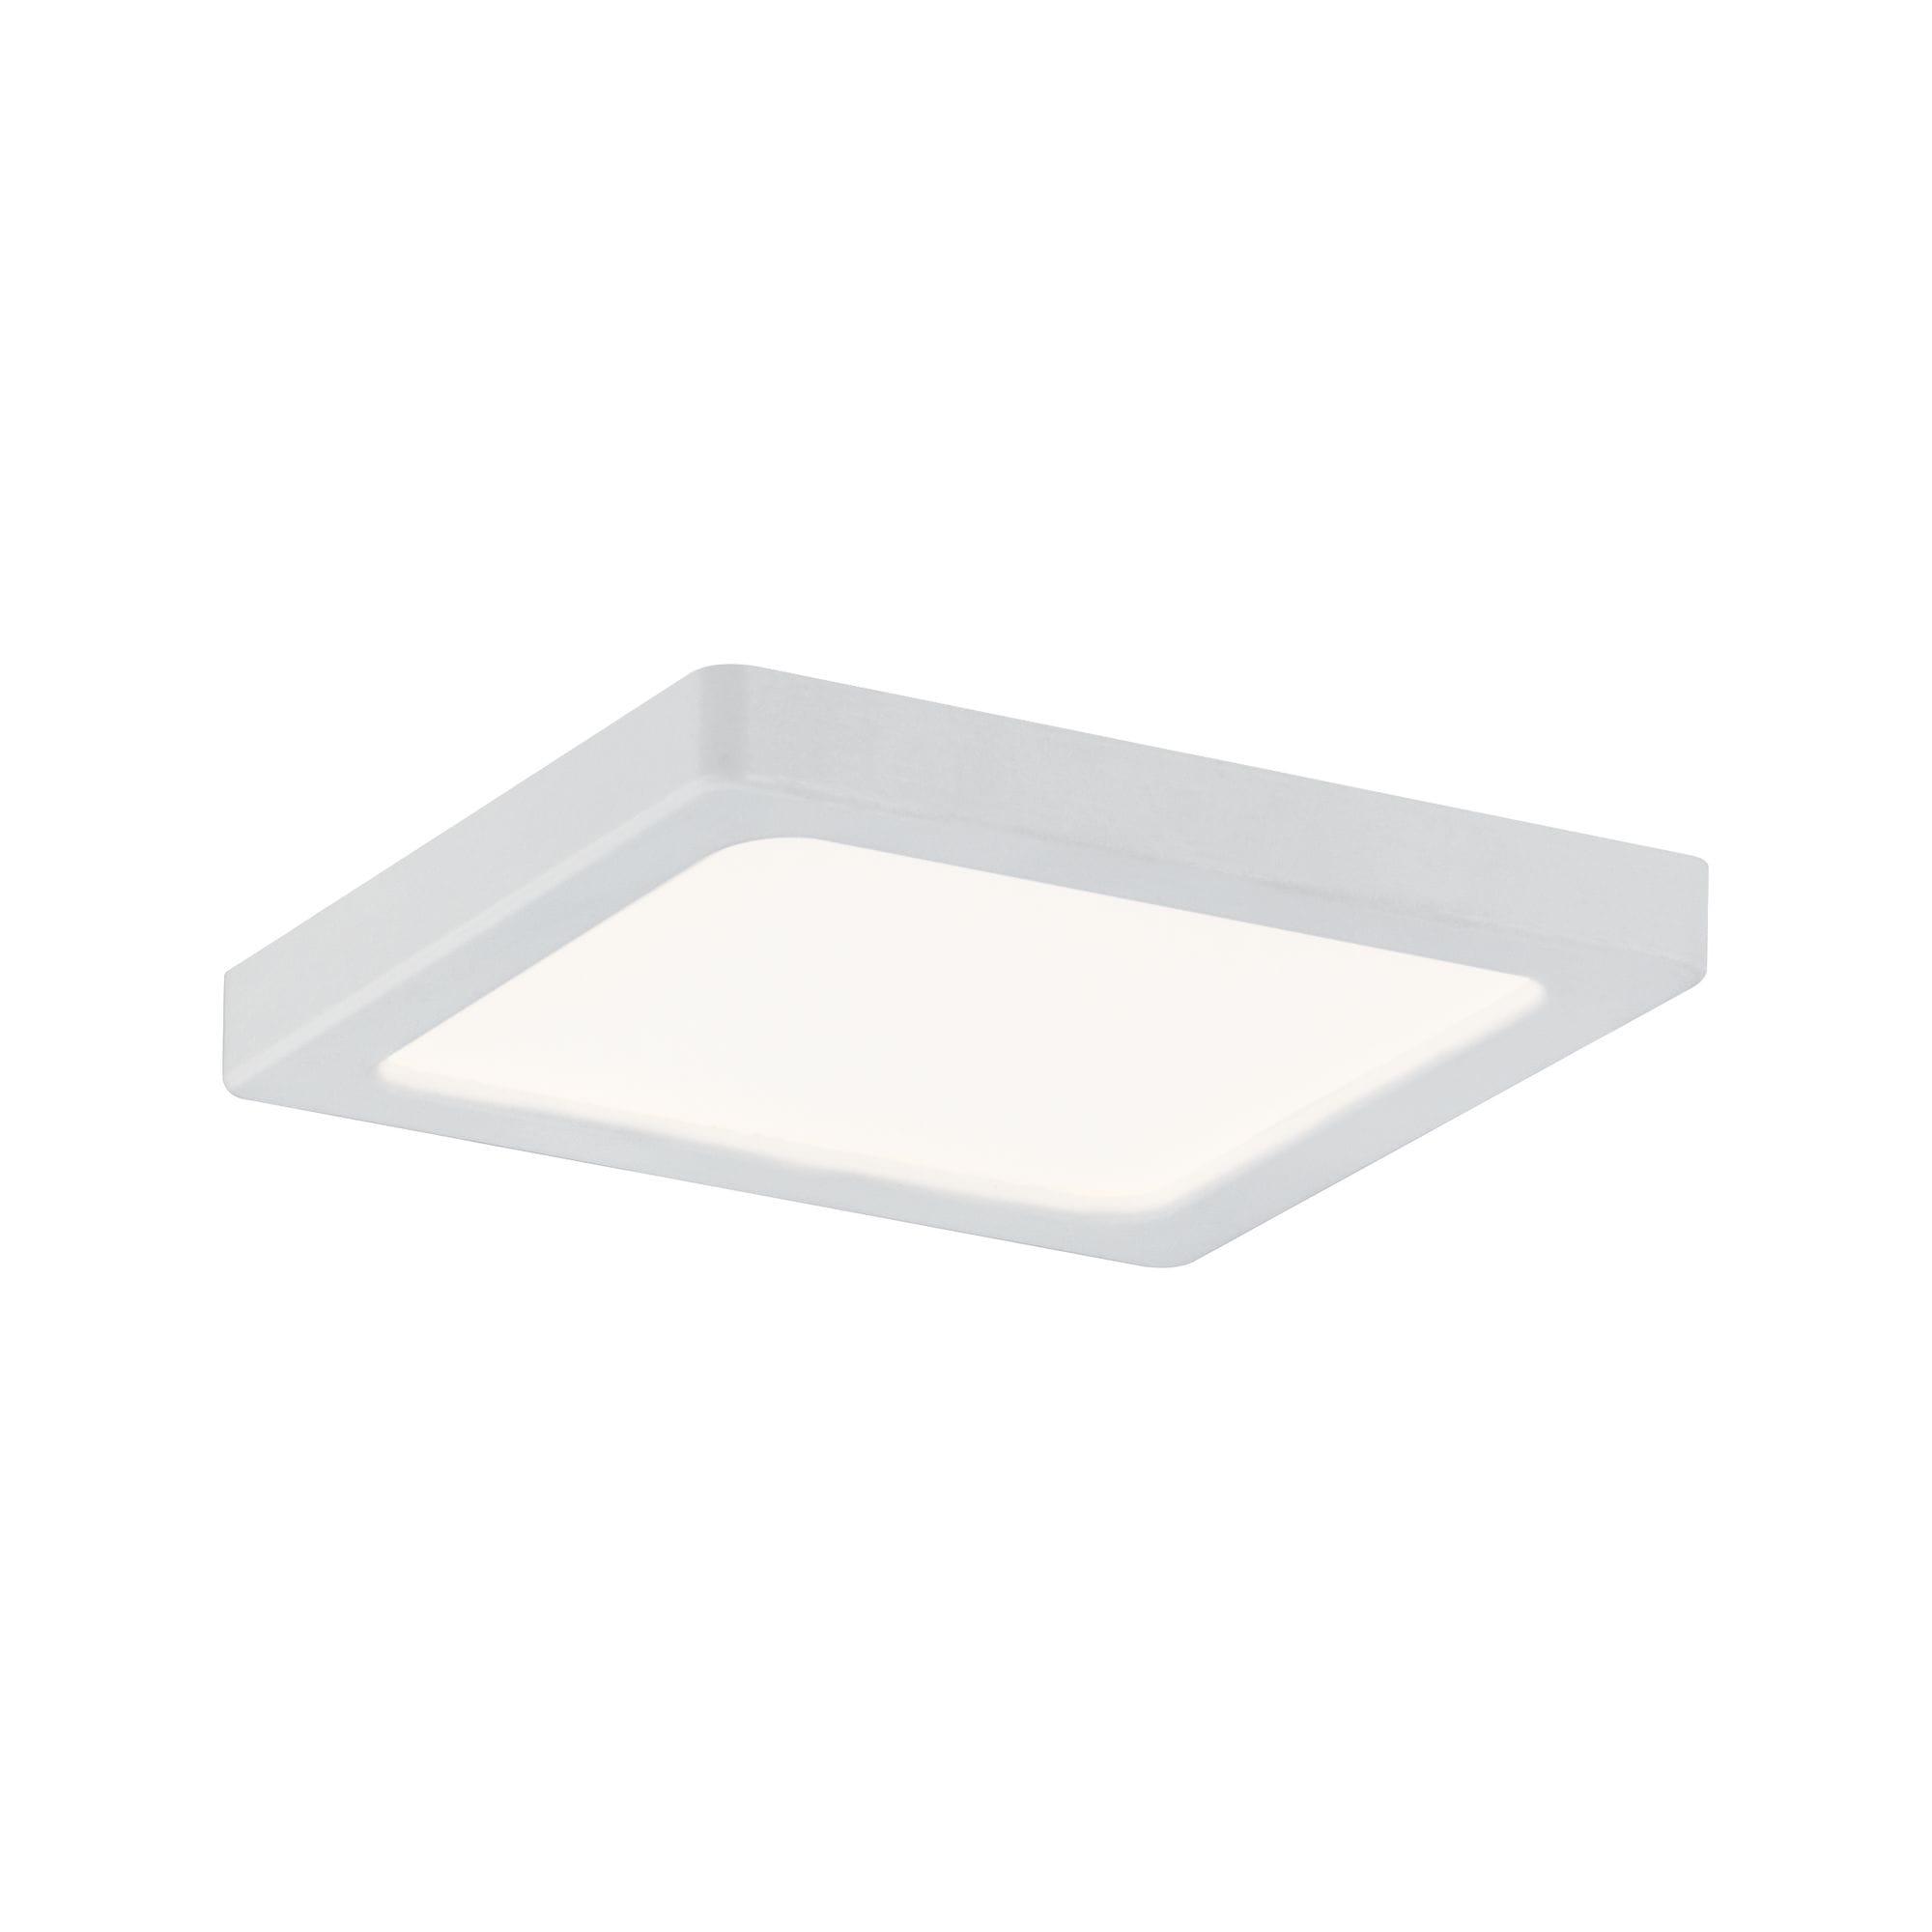 Paulmann LED Einbaustrahler Panel Areo IP23 eckig 80x80mm 5W 3.000K Weiß ma günstig online kaufen